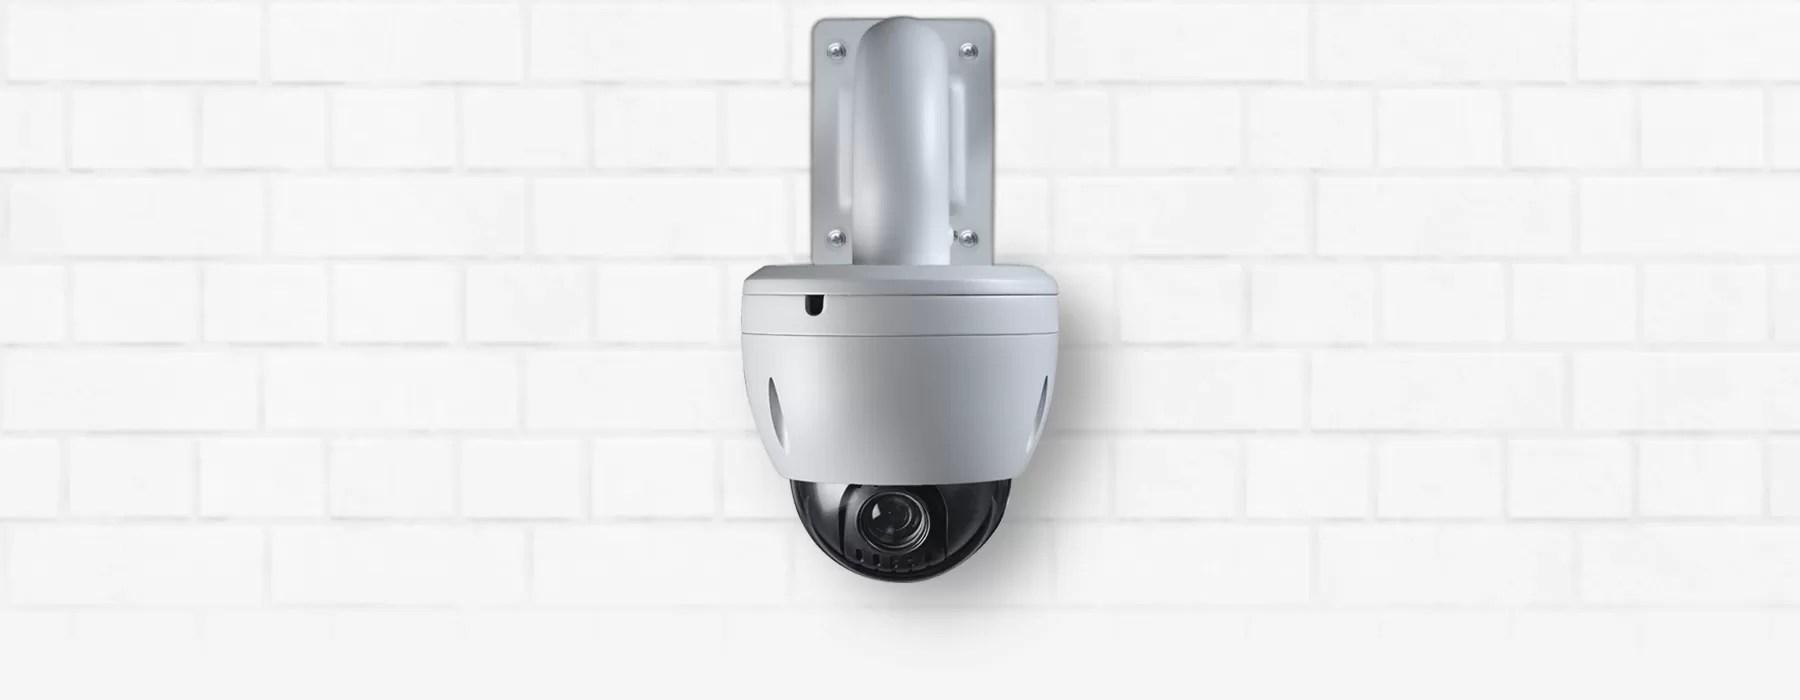 BBG security camera Midland